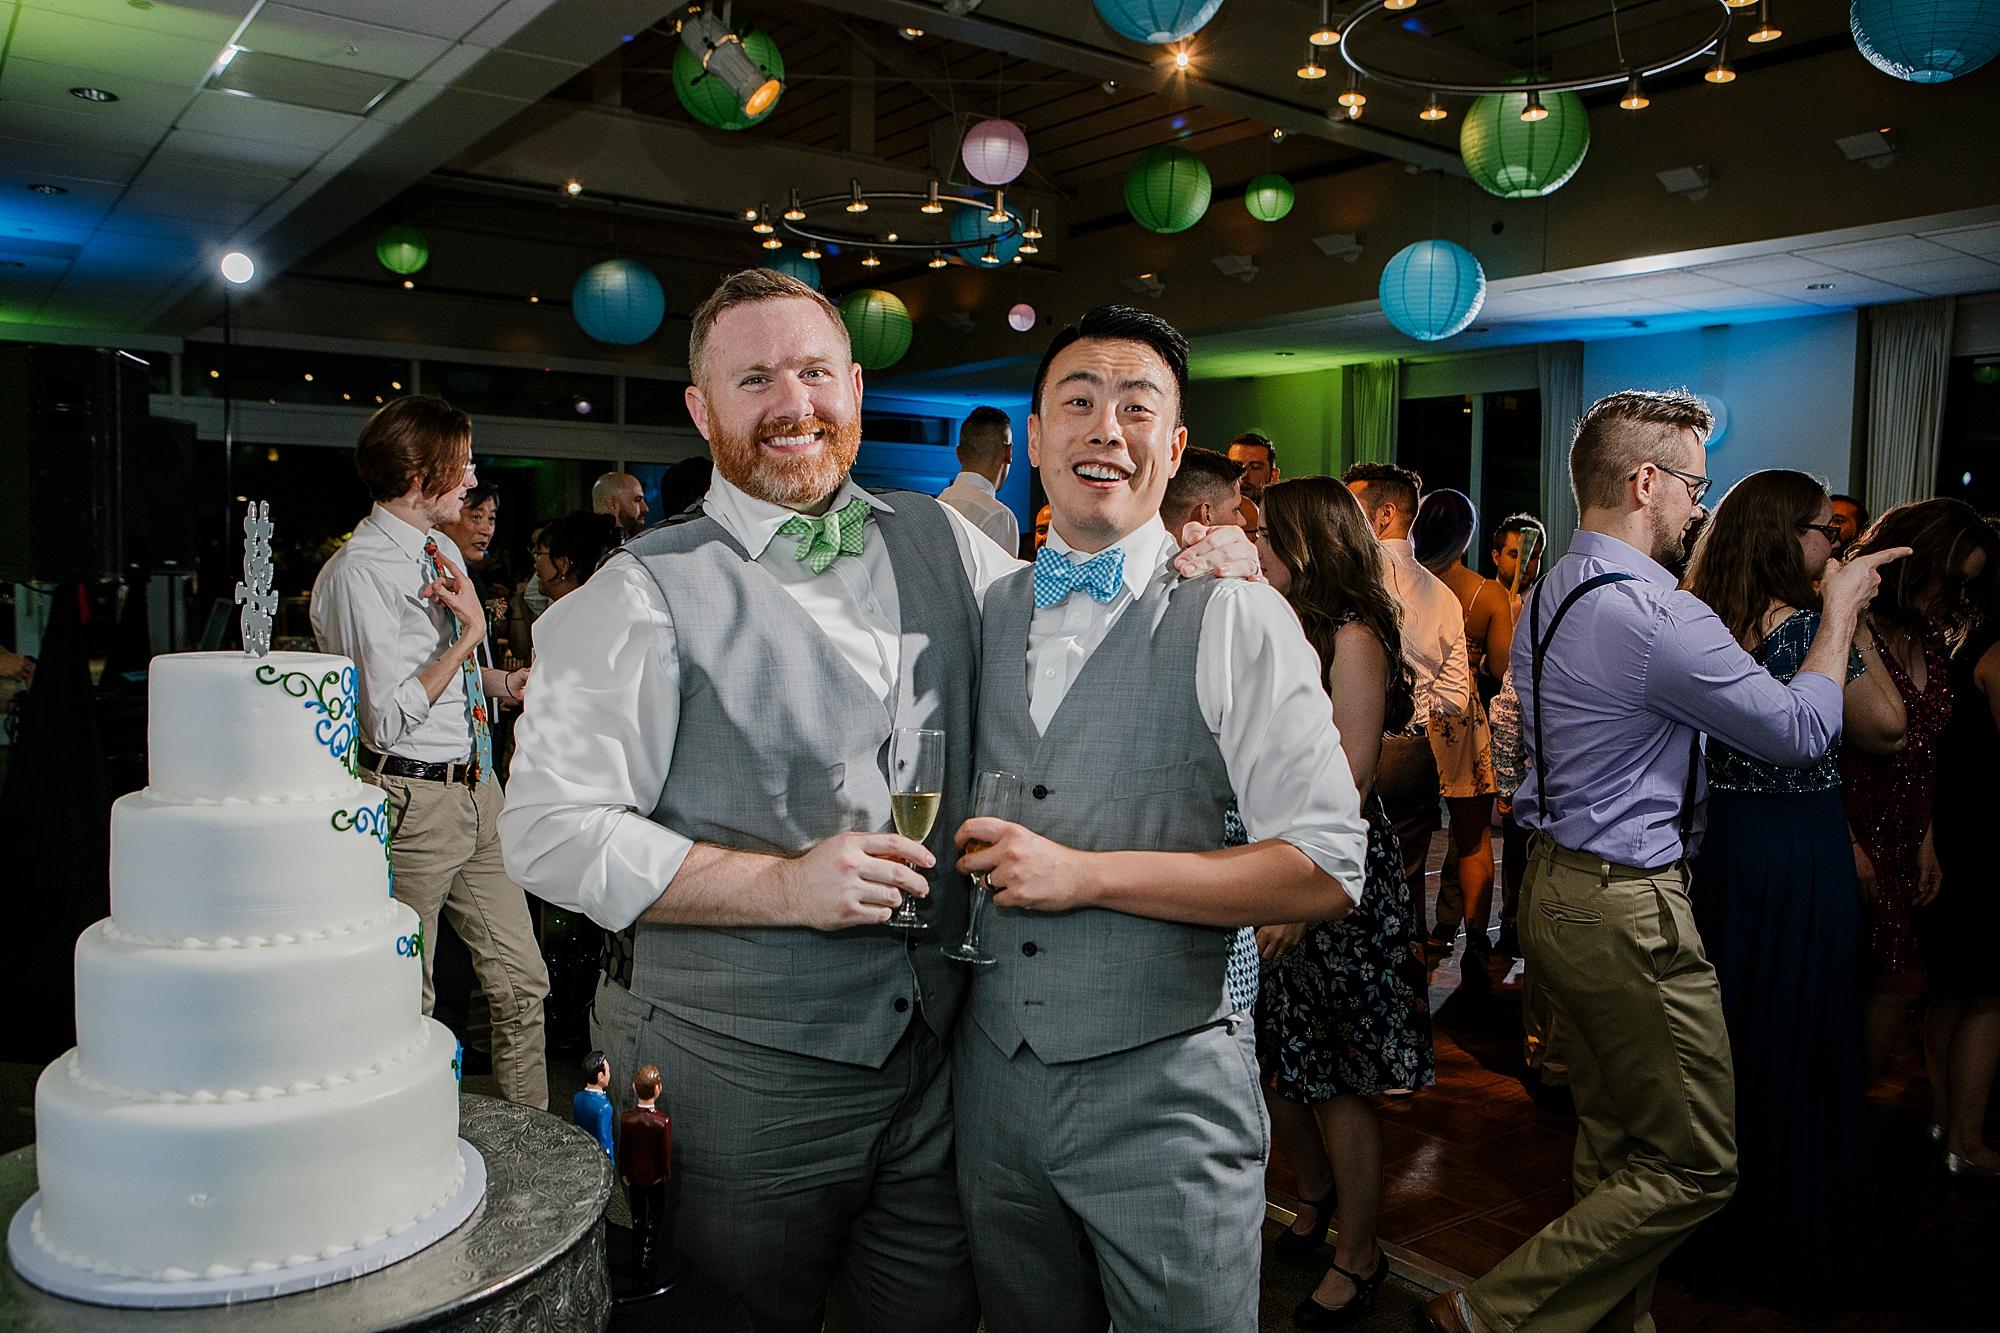 Dan_and_Byron_Love_by_Joe_Mac_Philadelphia_Wedding_LGBTQ_Photography_Gay_Independence_visitor_Center_141.JPG